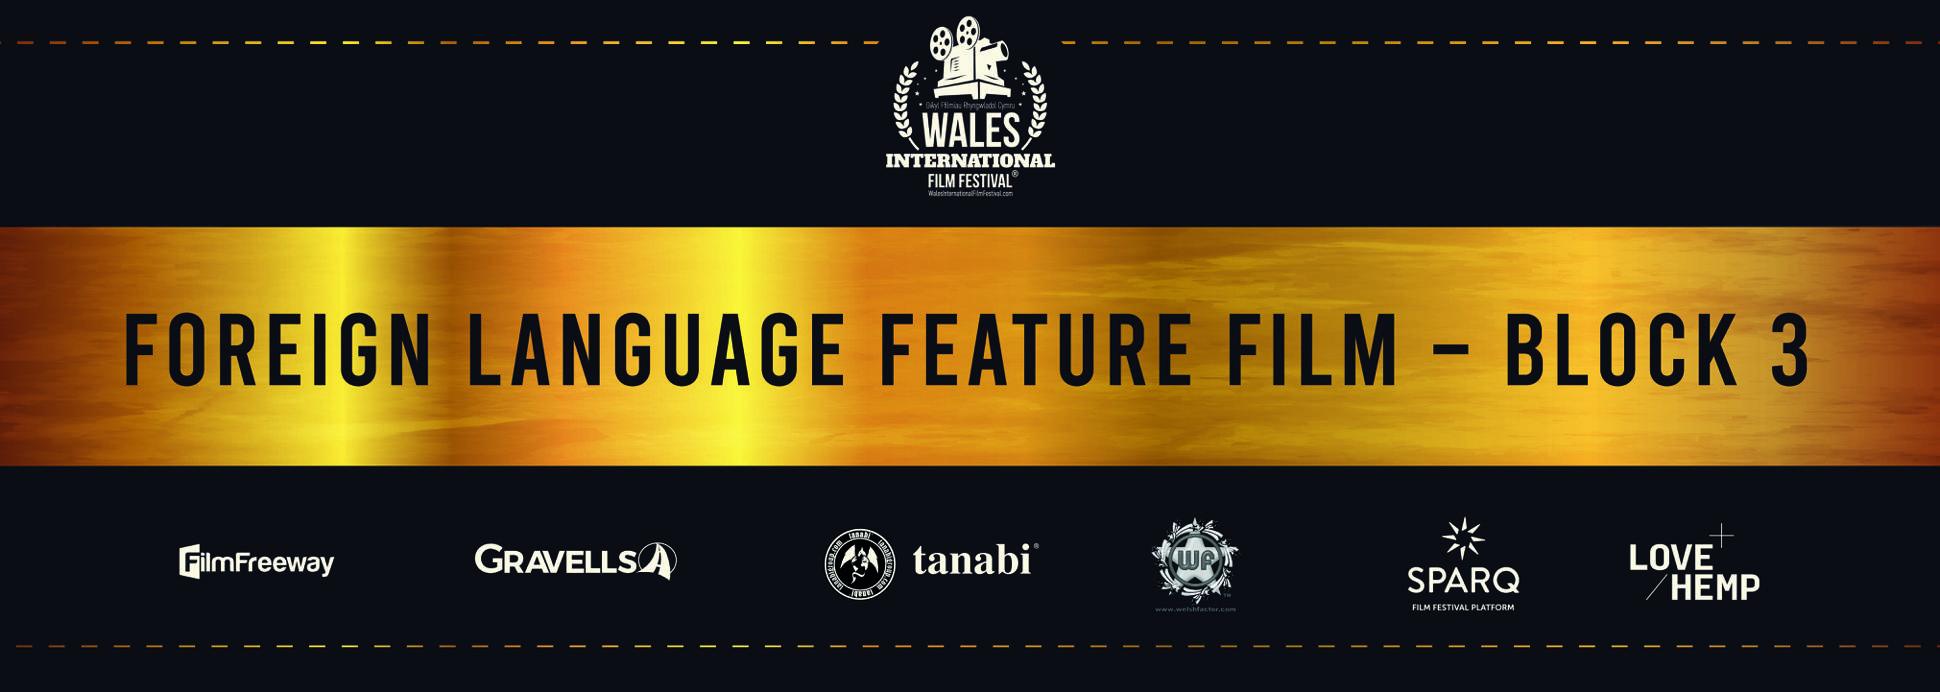 Foreign Language Feature Film - Block 3